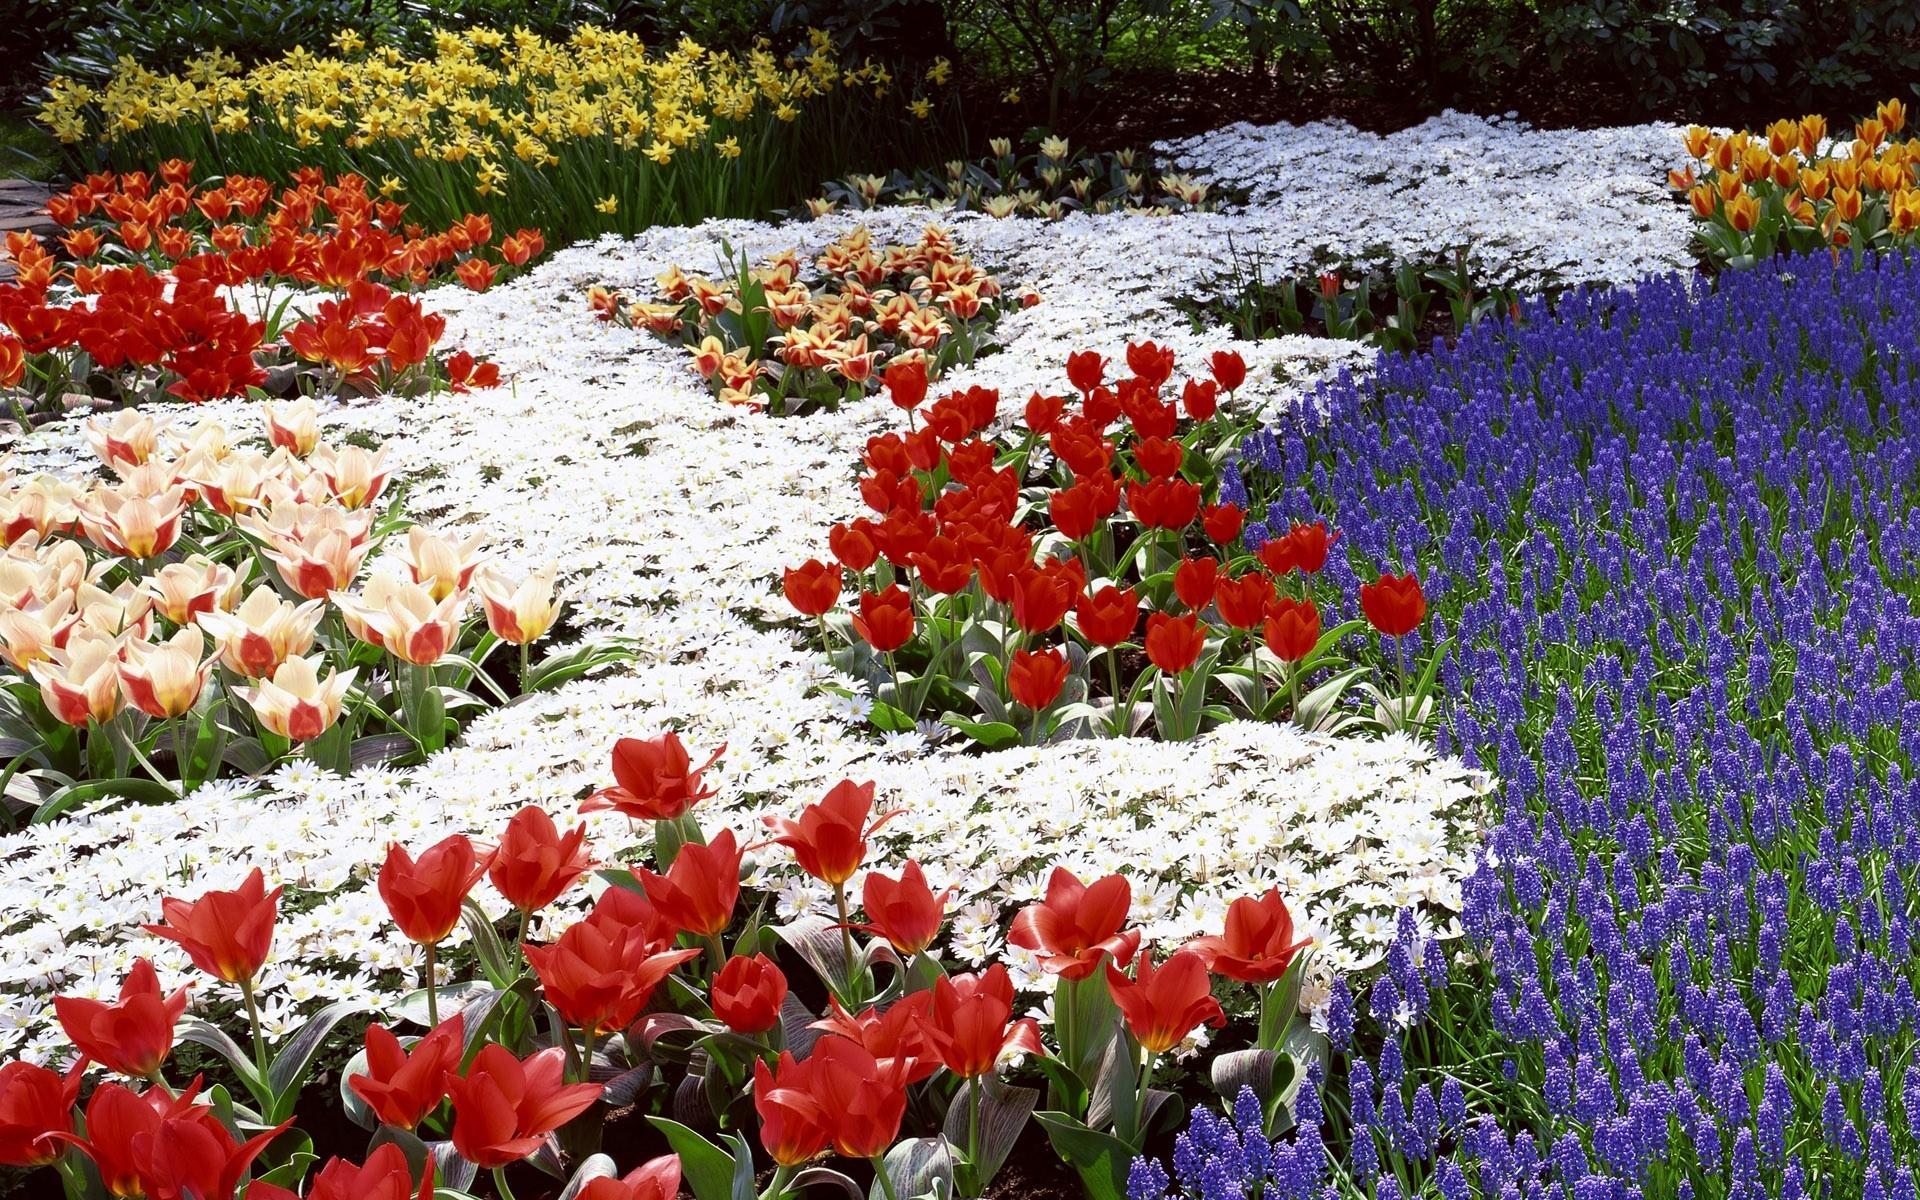 Весенние цветы в парке - скачать обои ...: https://million-wallpapers.ru/wallpaper/vesennie-cvety-v-parke/id...